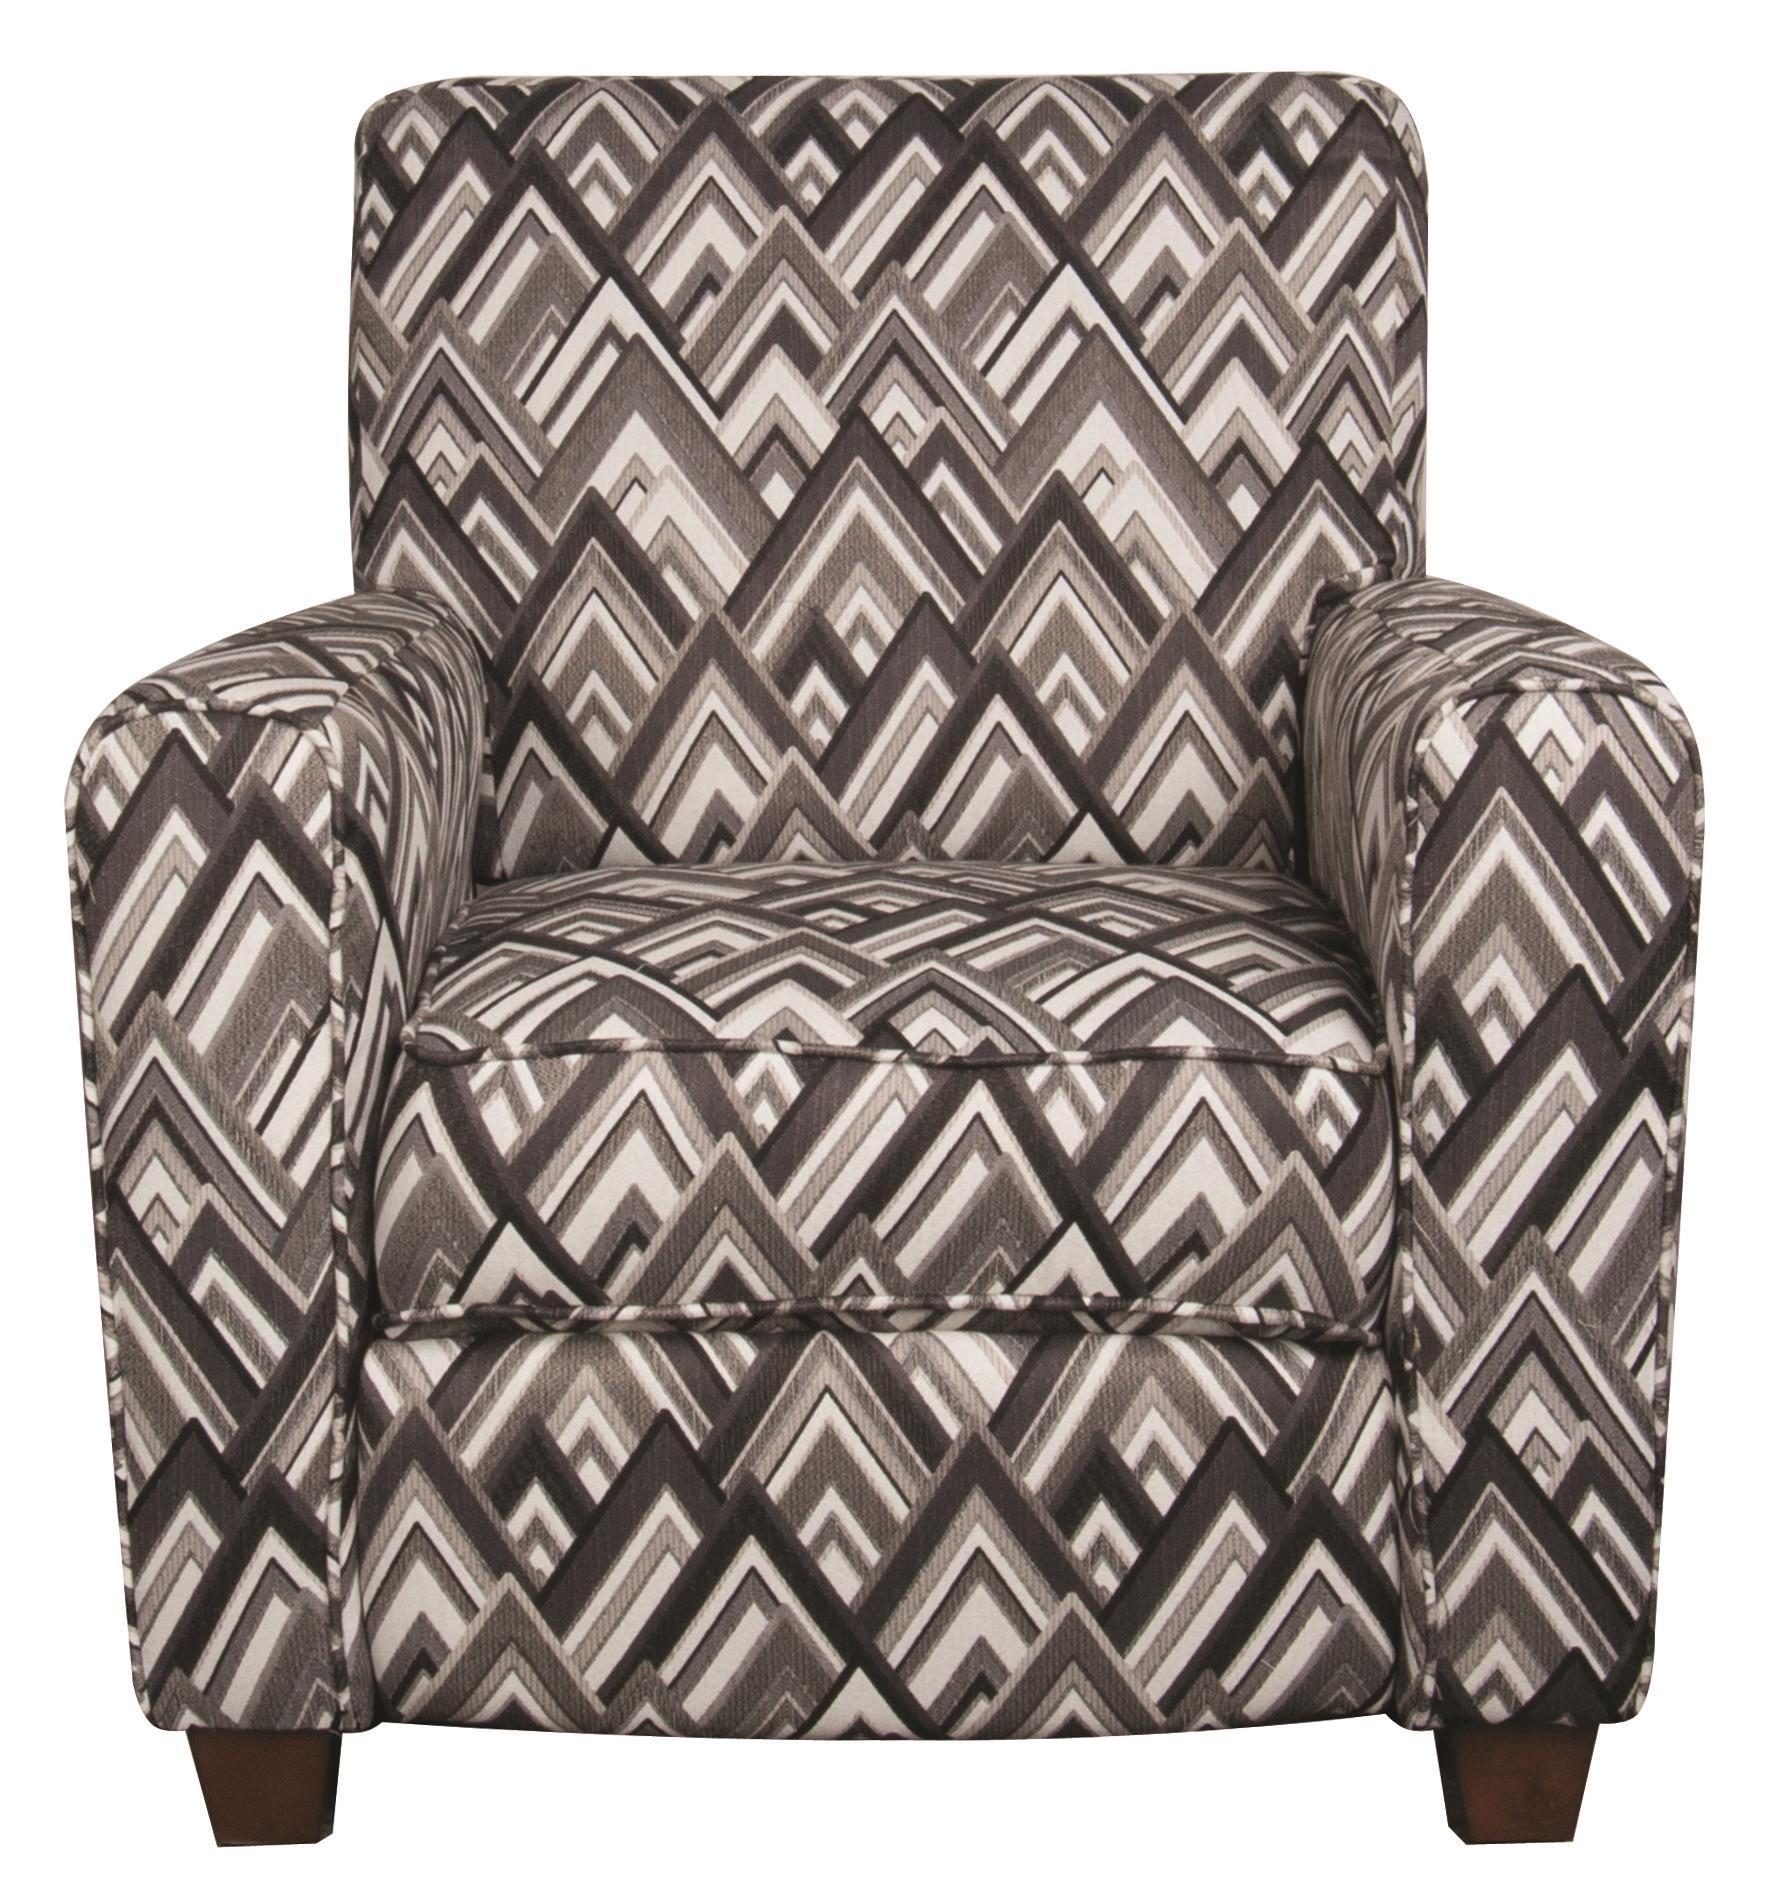 Morris Home Furnishings Wilson Wilson Recliner - Item Number: 360616521